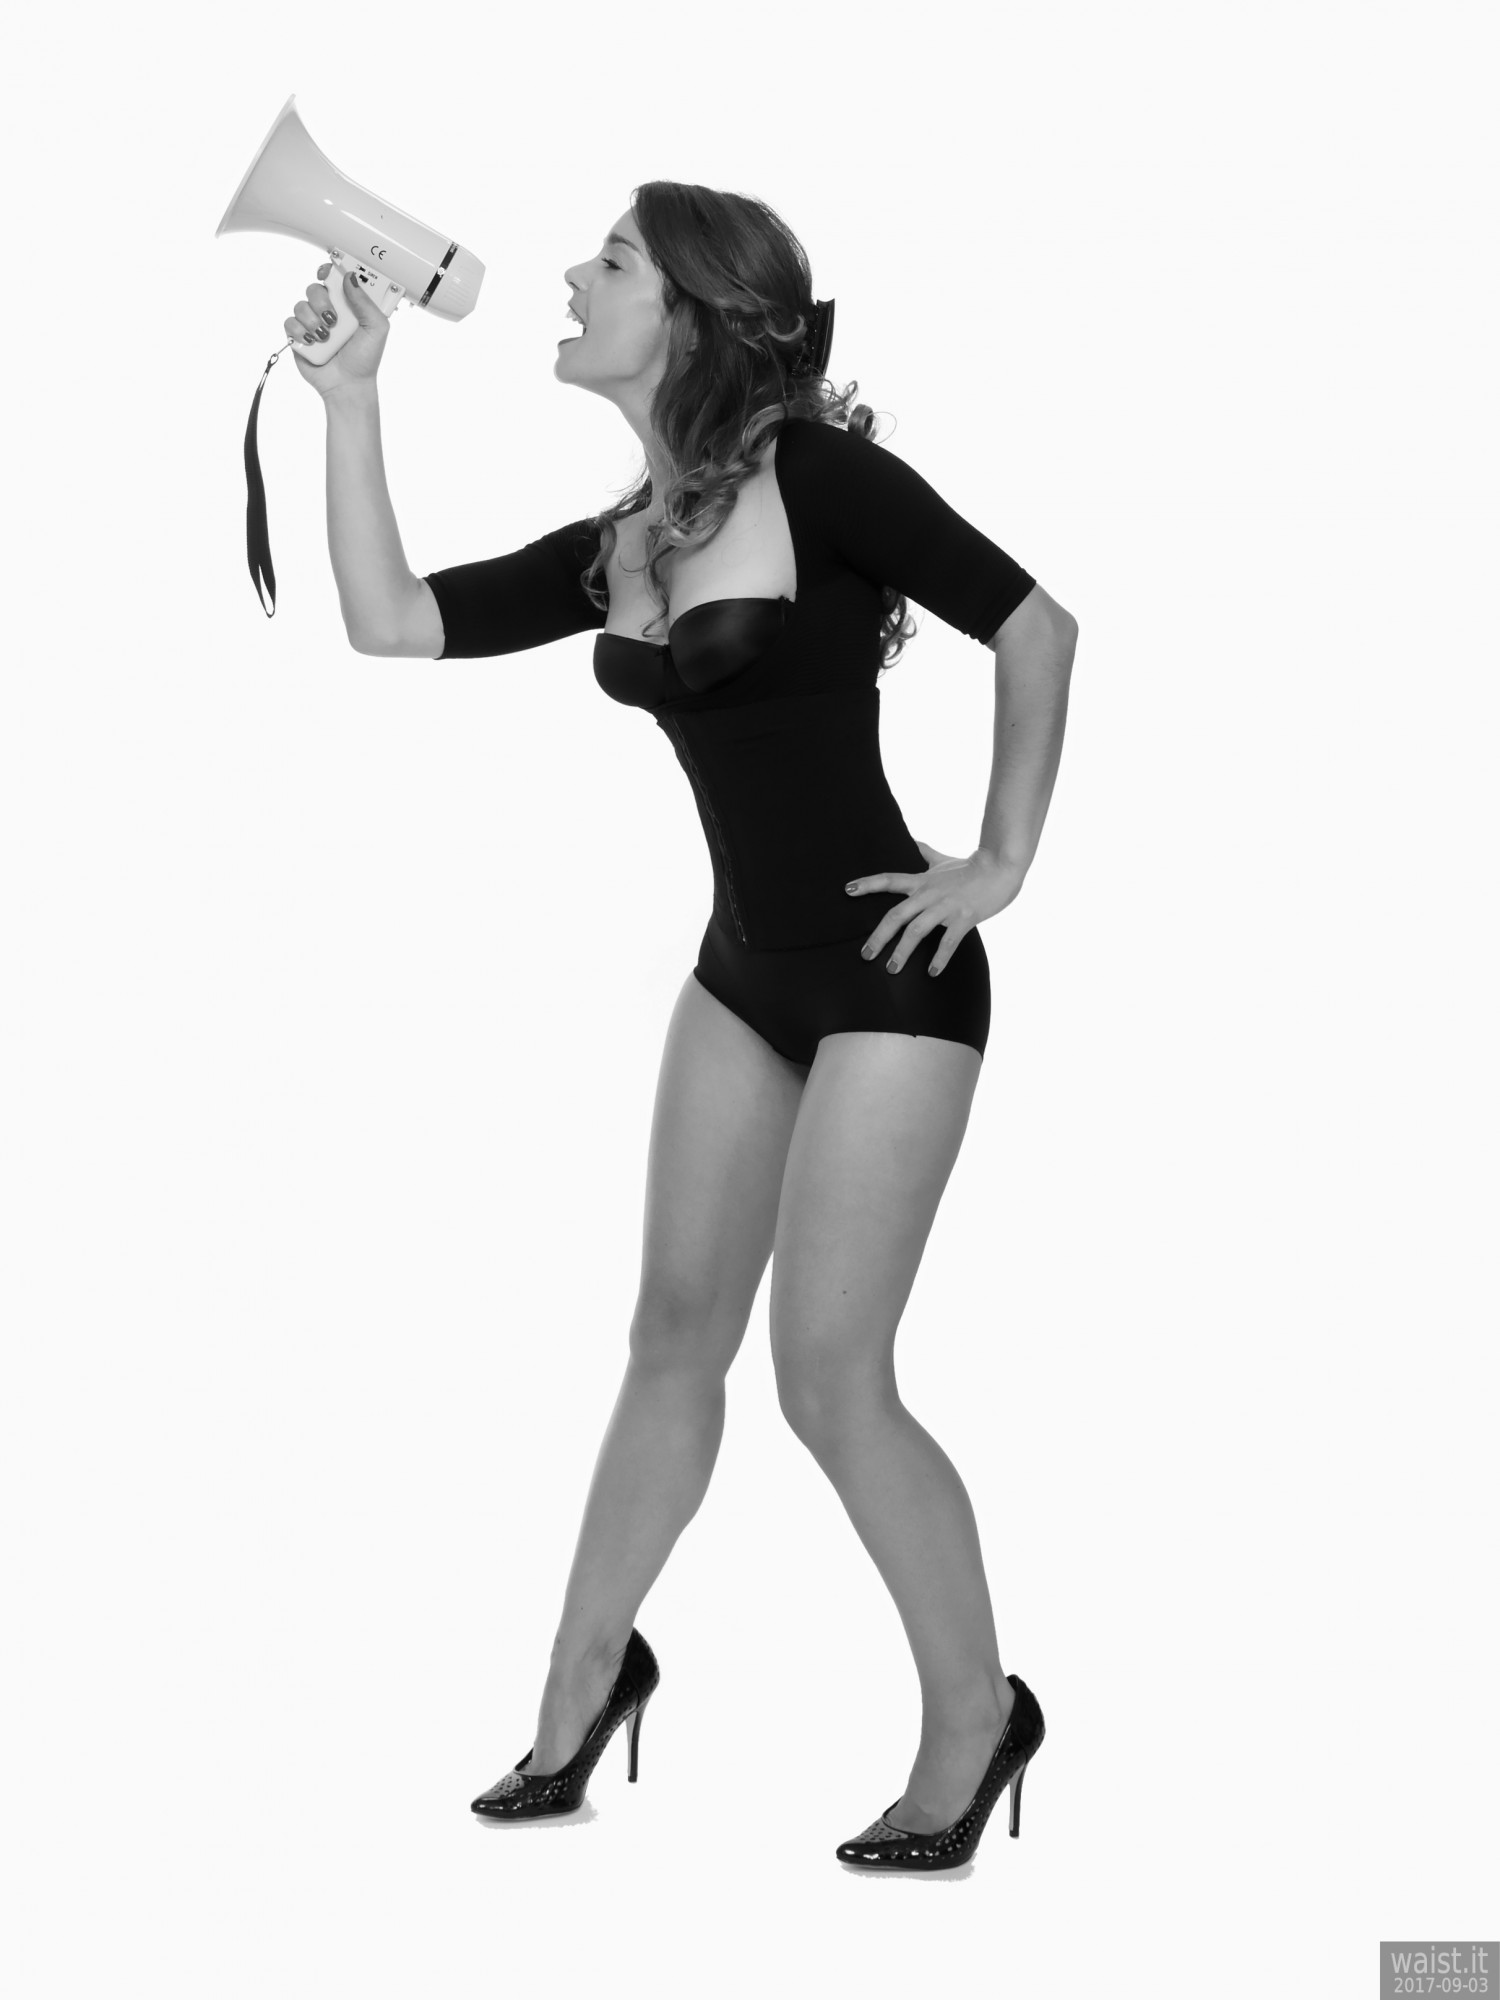 2017-09-03 Paula Soares in black bra, posture top and control briefs worn as hotpants holding megaphone